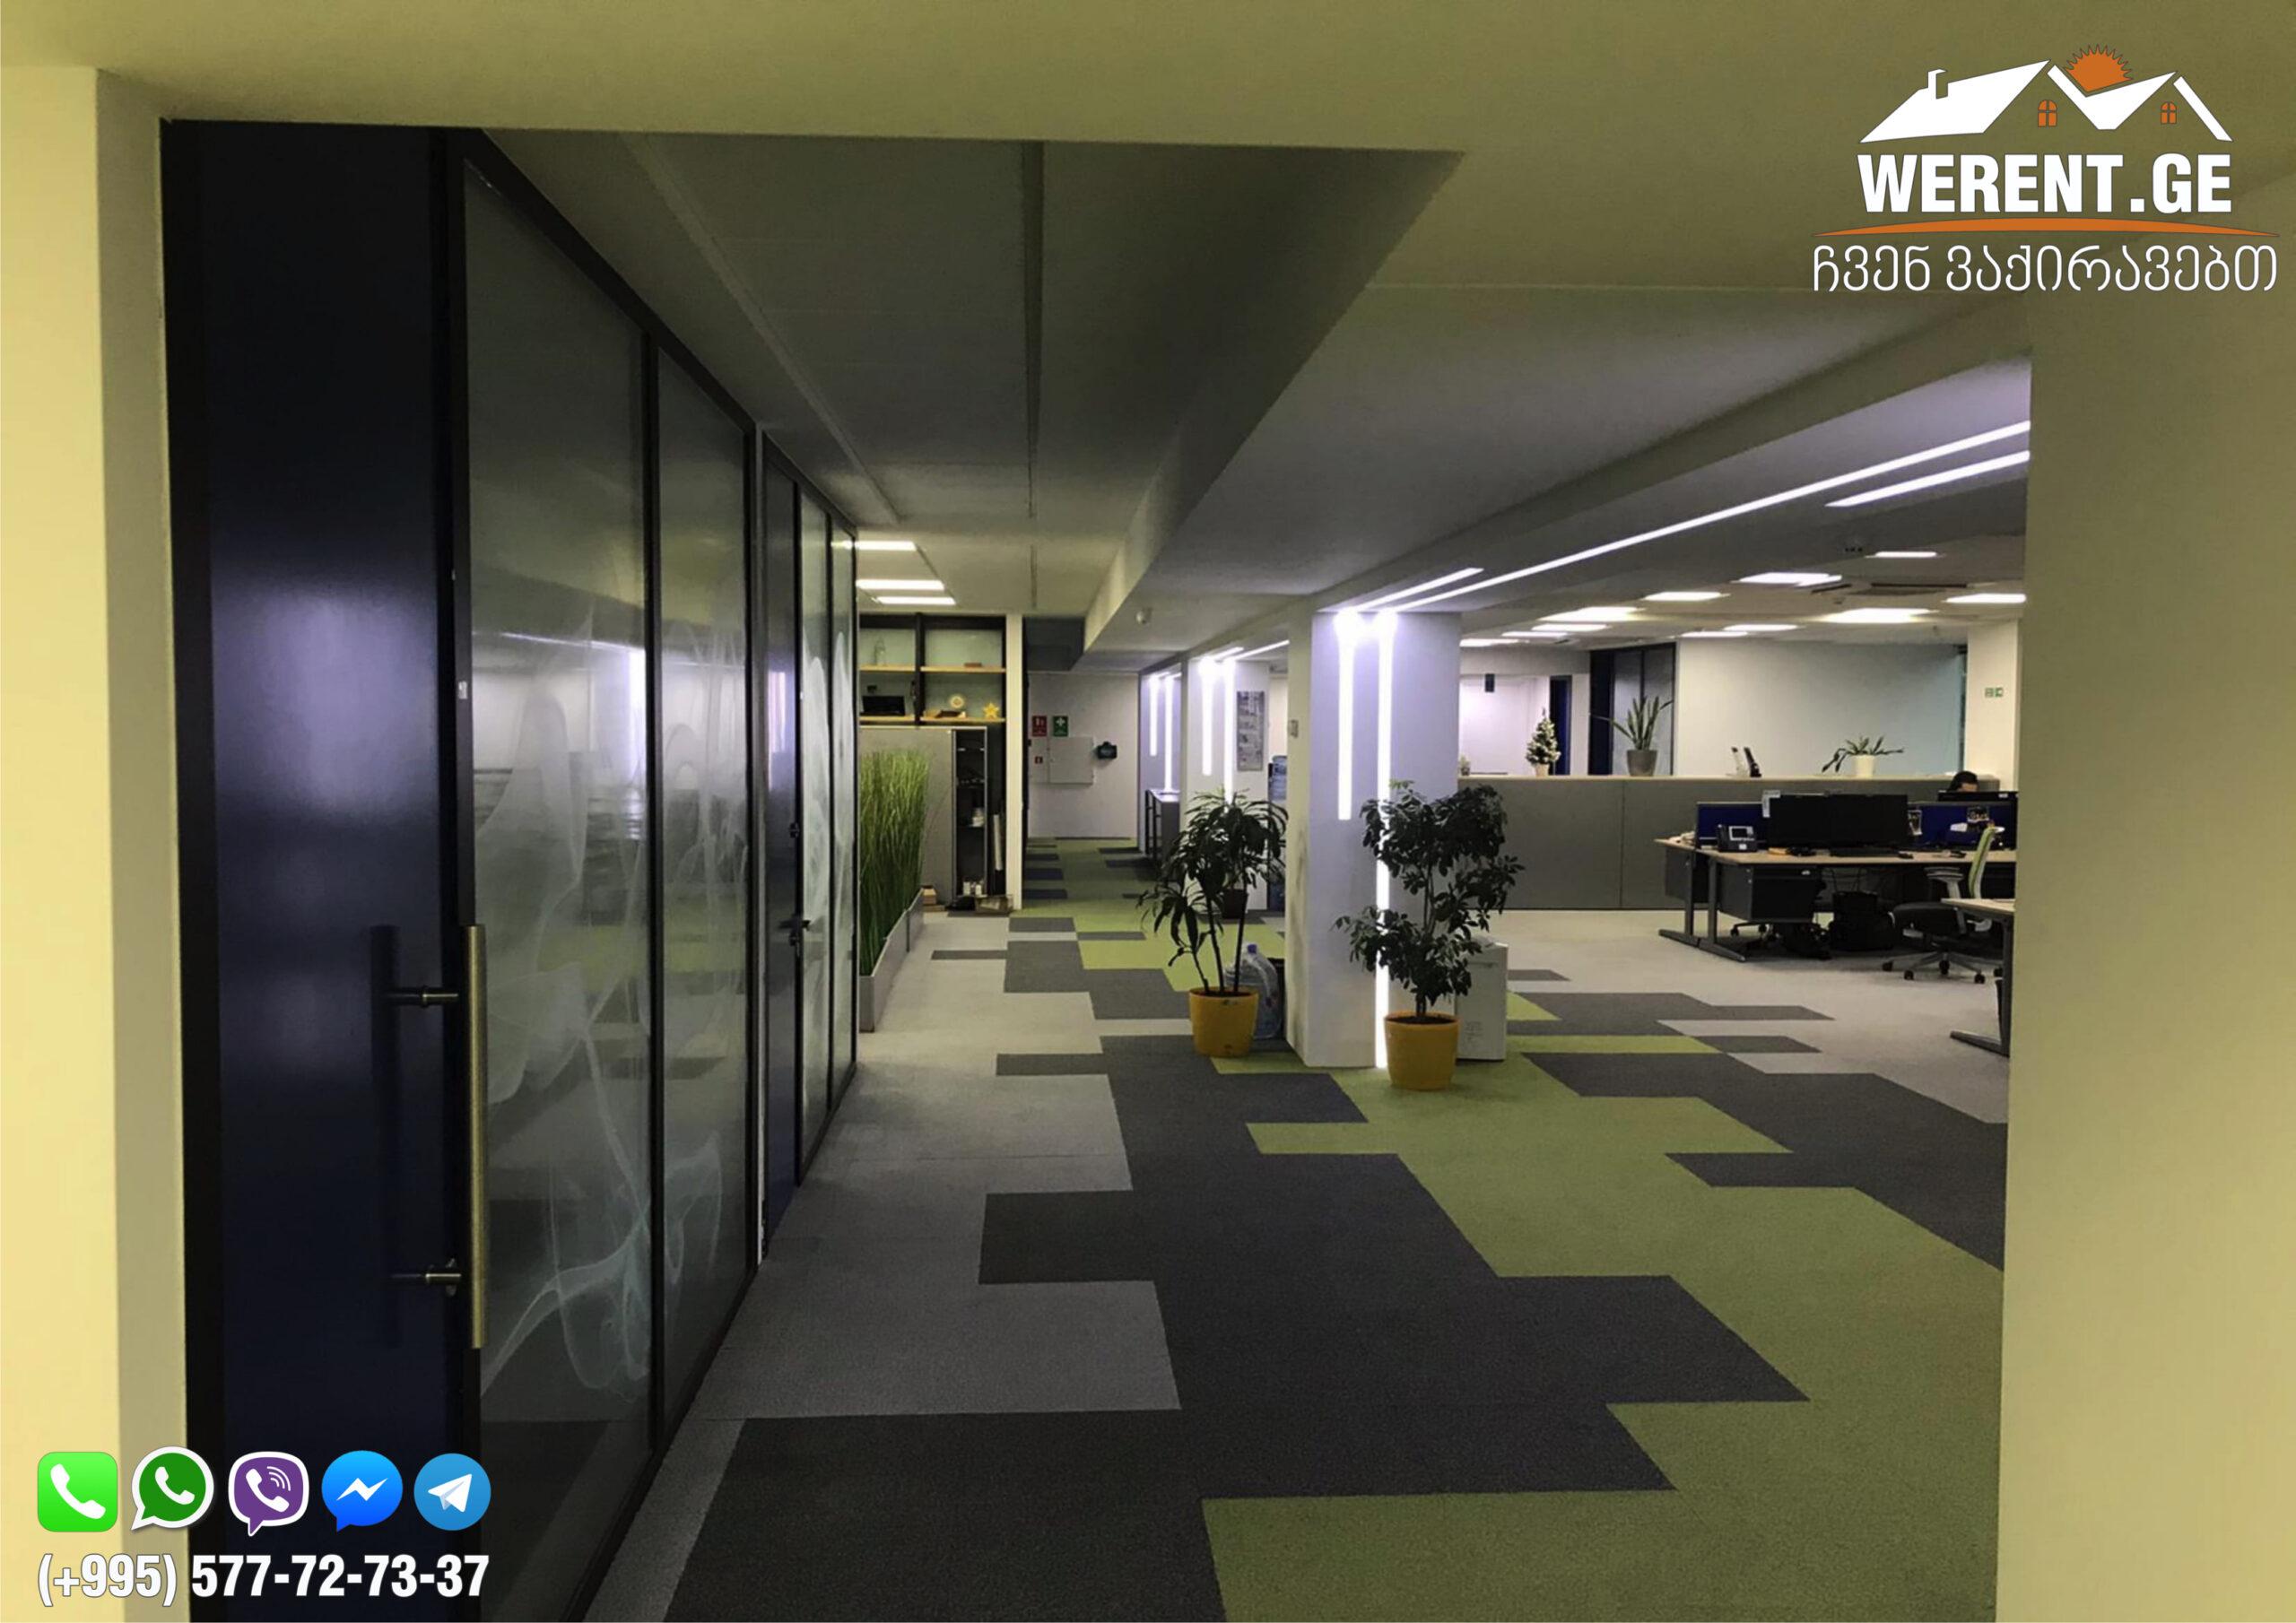 BCV presentation office space 689 sq m-08_wm